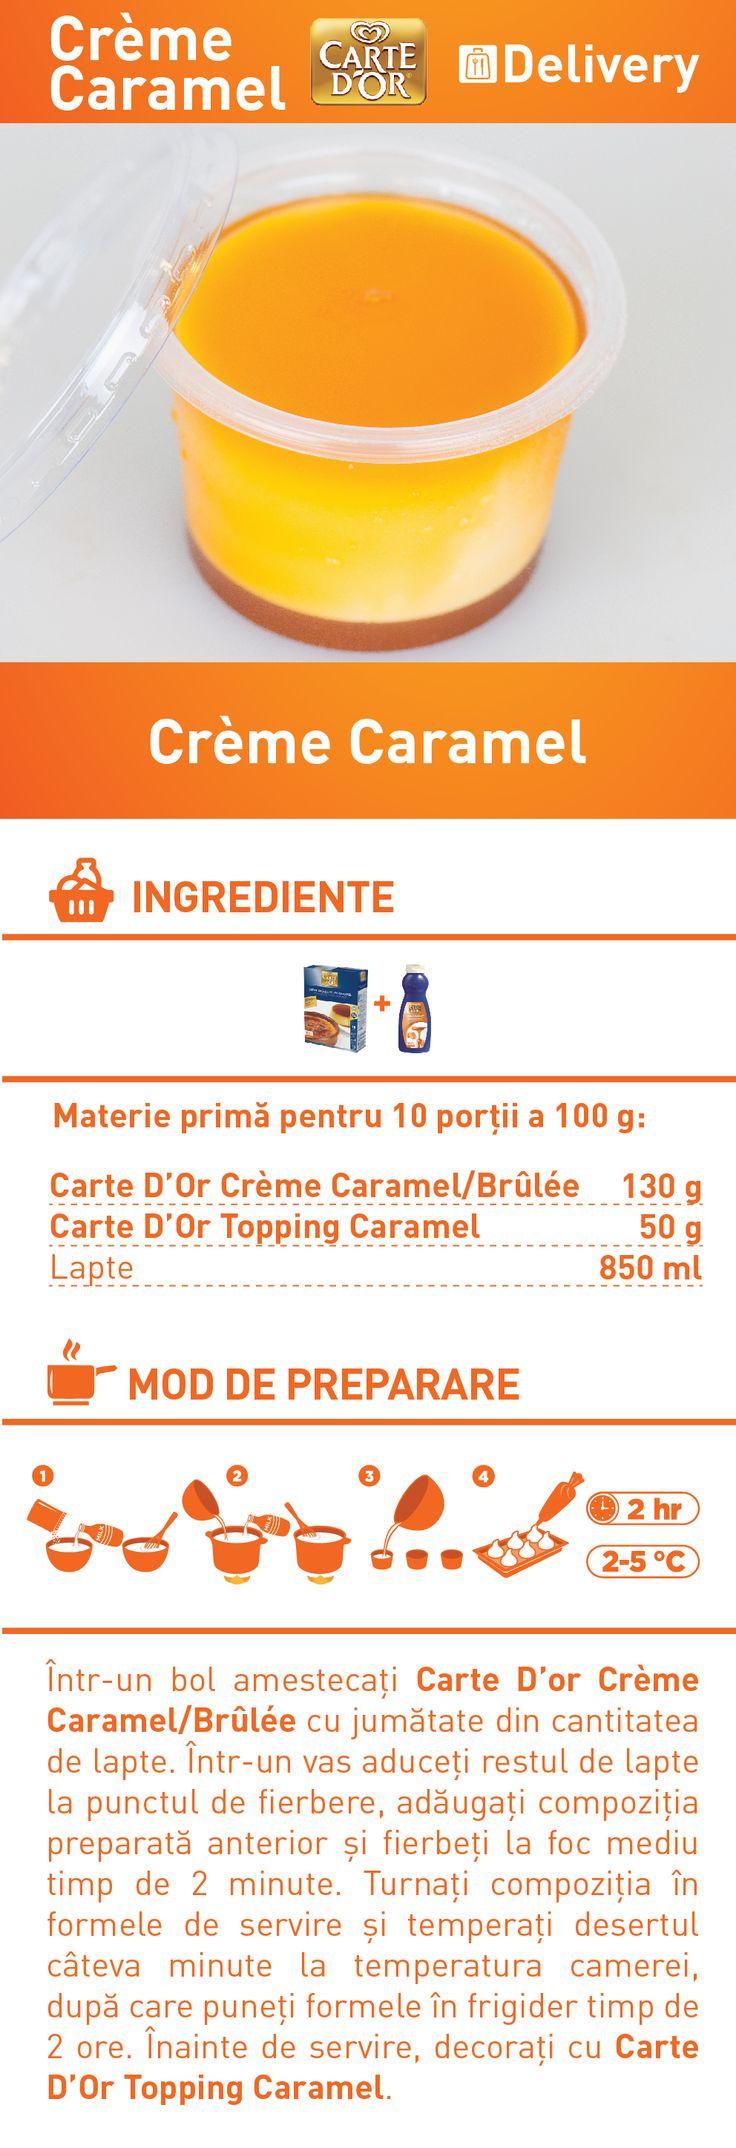 Creme Caramel - RETETA